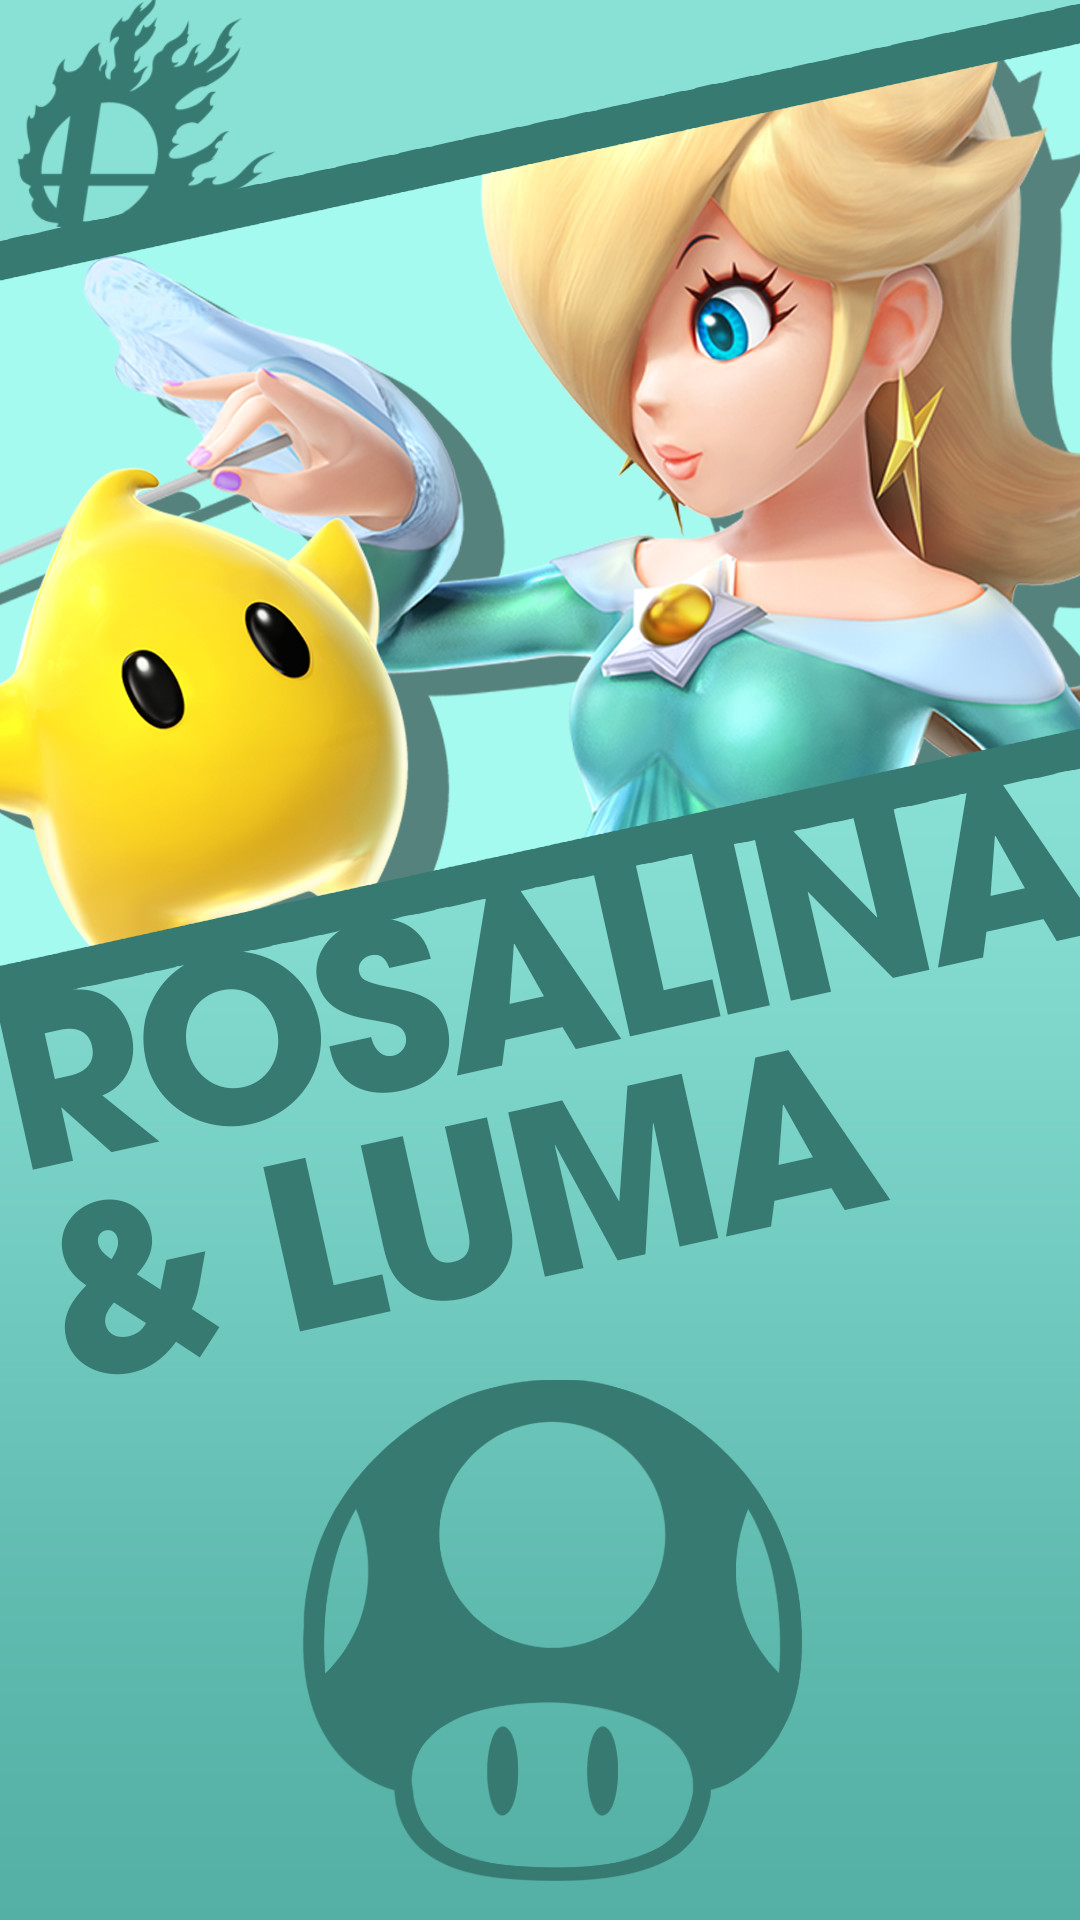 Phone Wallpaper by MrThatKidAlex24 Rosalina and Luma Smash Bros. Phone  Wallpaper by MrThatKidAlex24